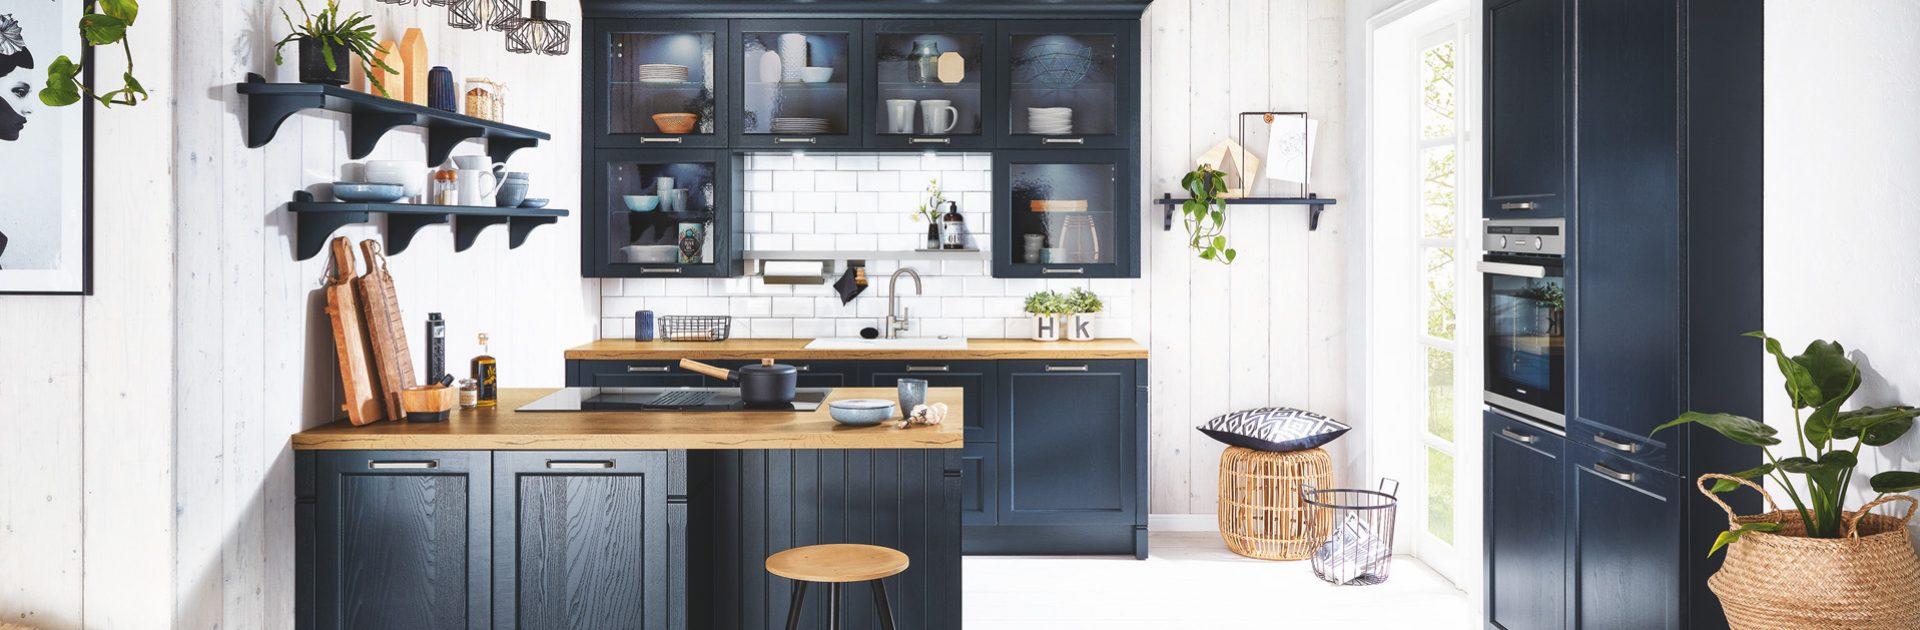 Tips keukenkast inrichten | Eigenhuis Keukens